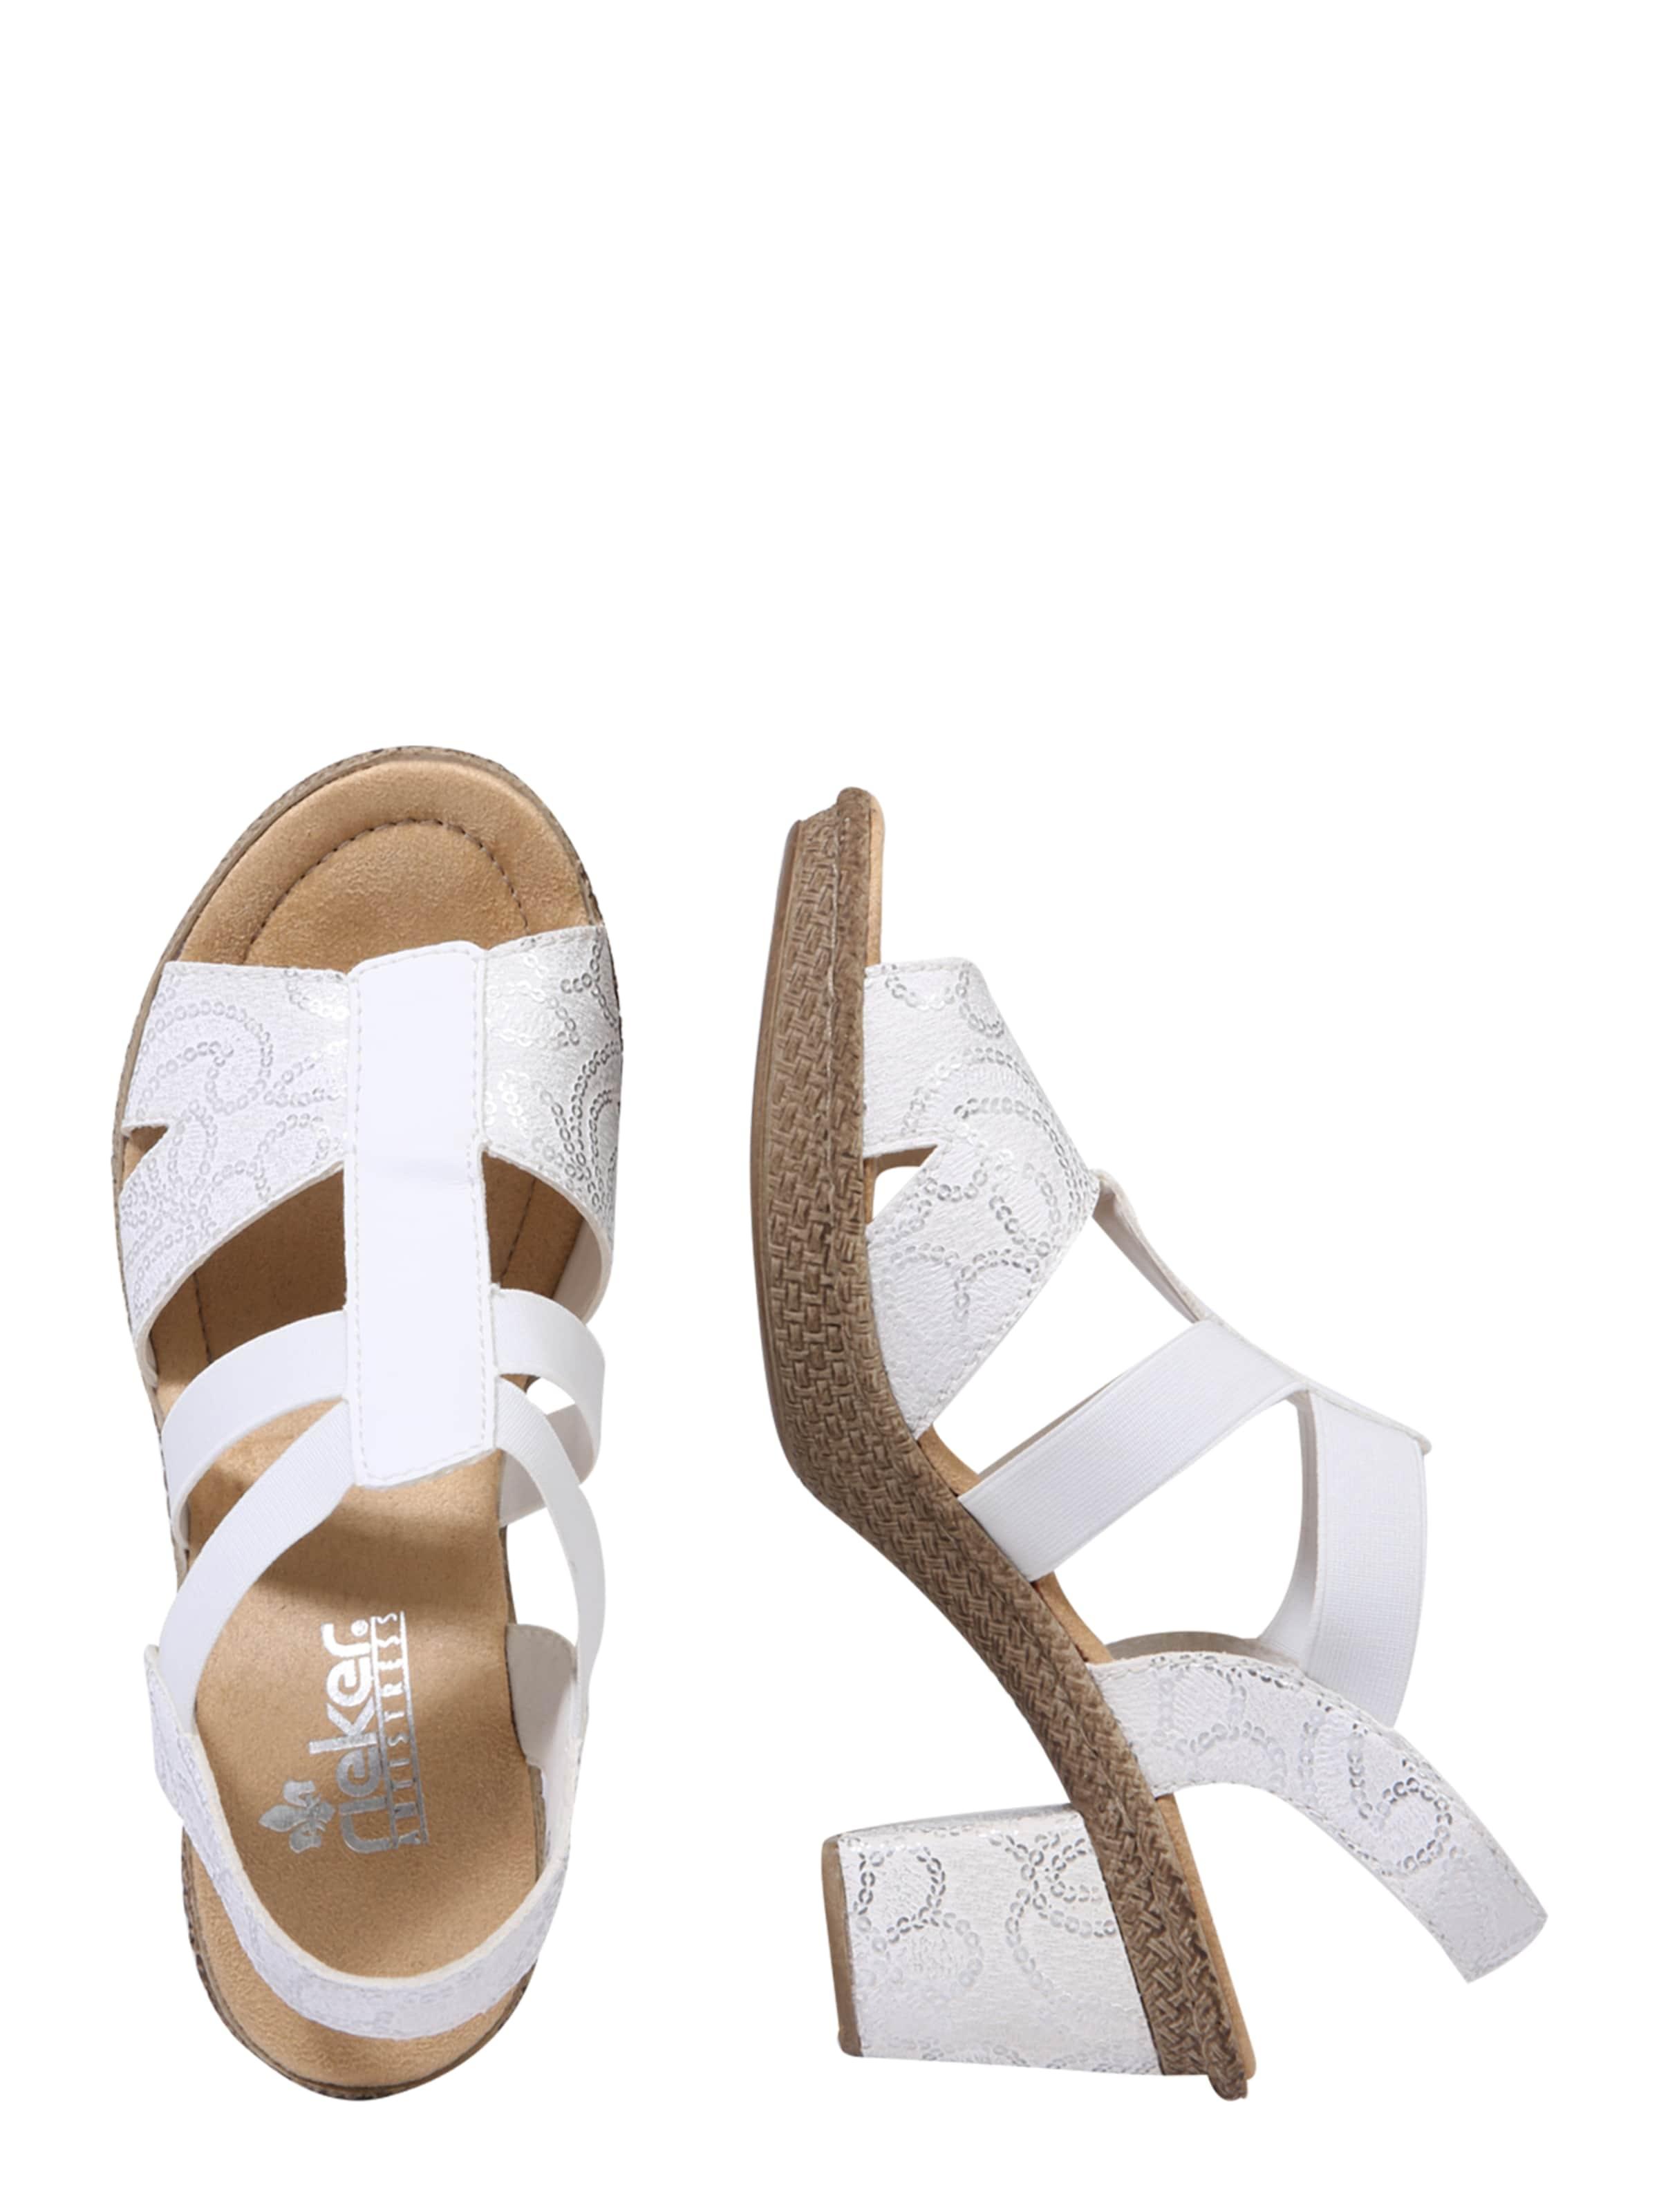 Sandale SilberWeiß Rieker SilberWeiß Rieker Rieker Sandale In Sandale In 7Ygvbyf6